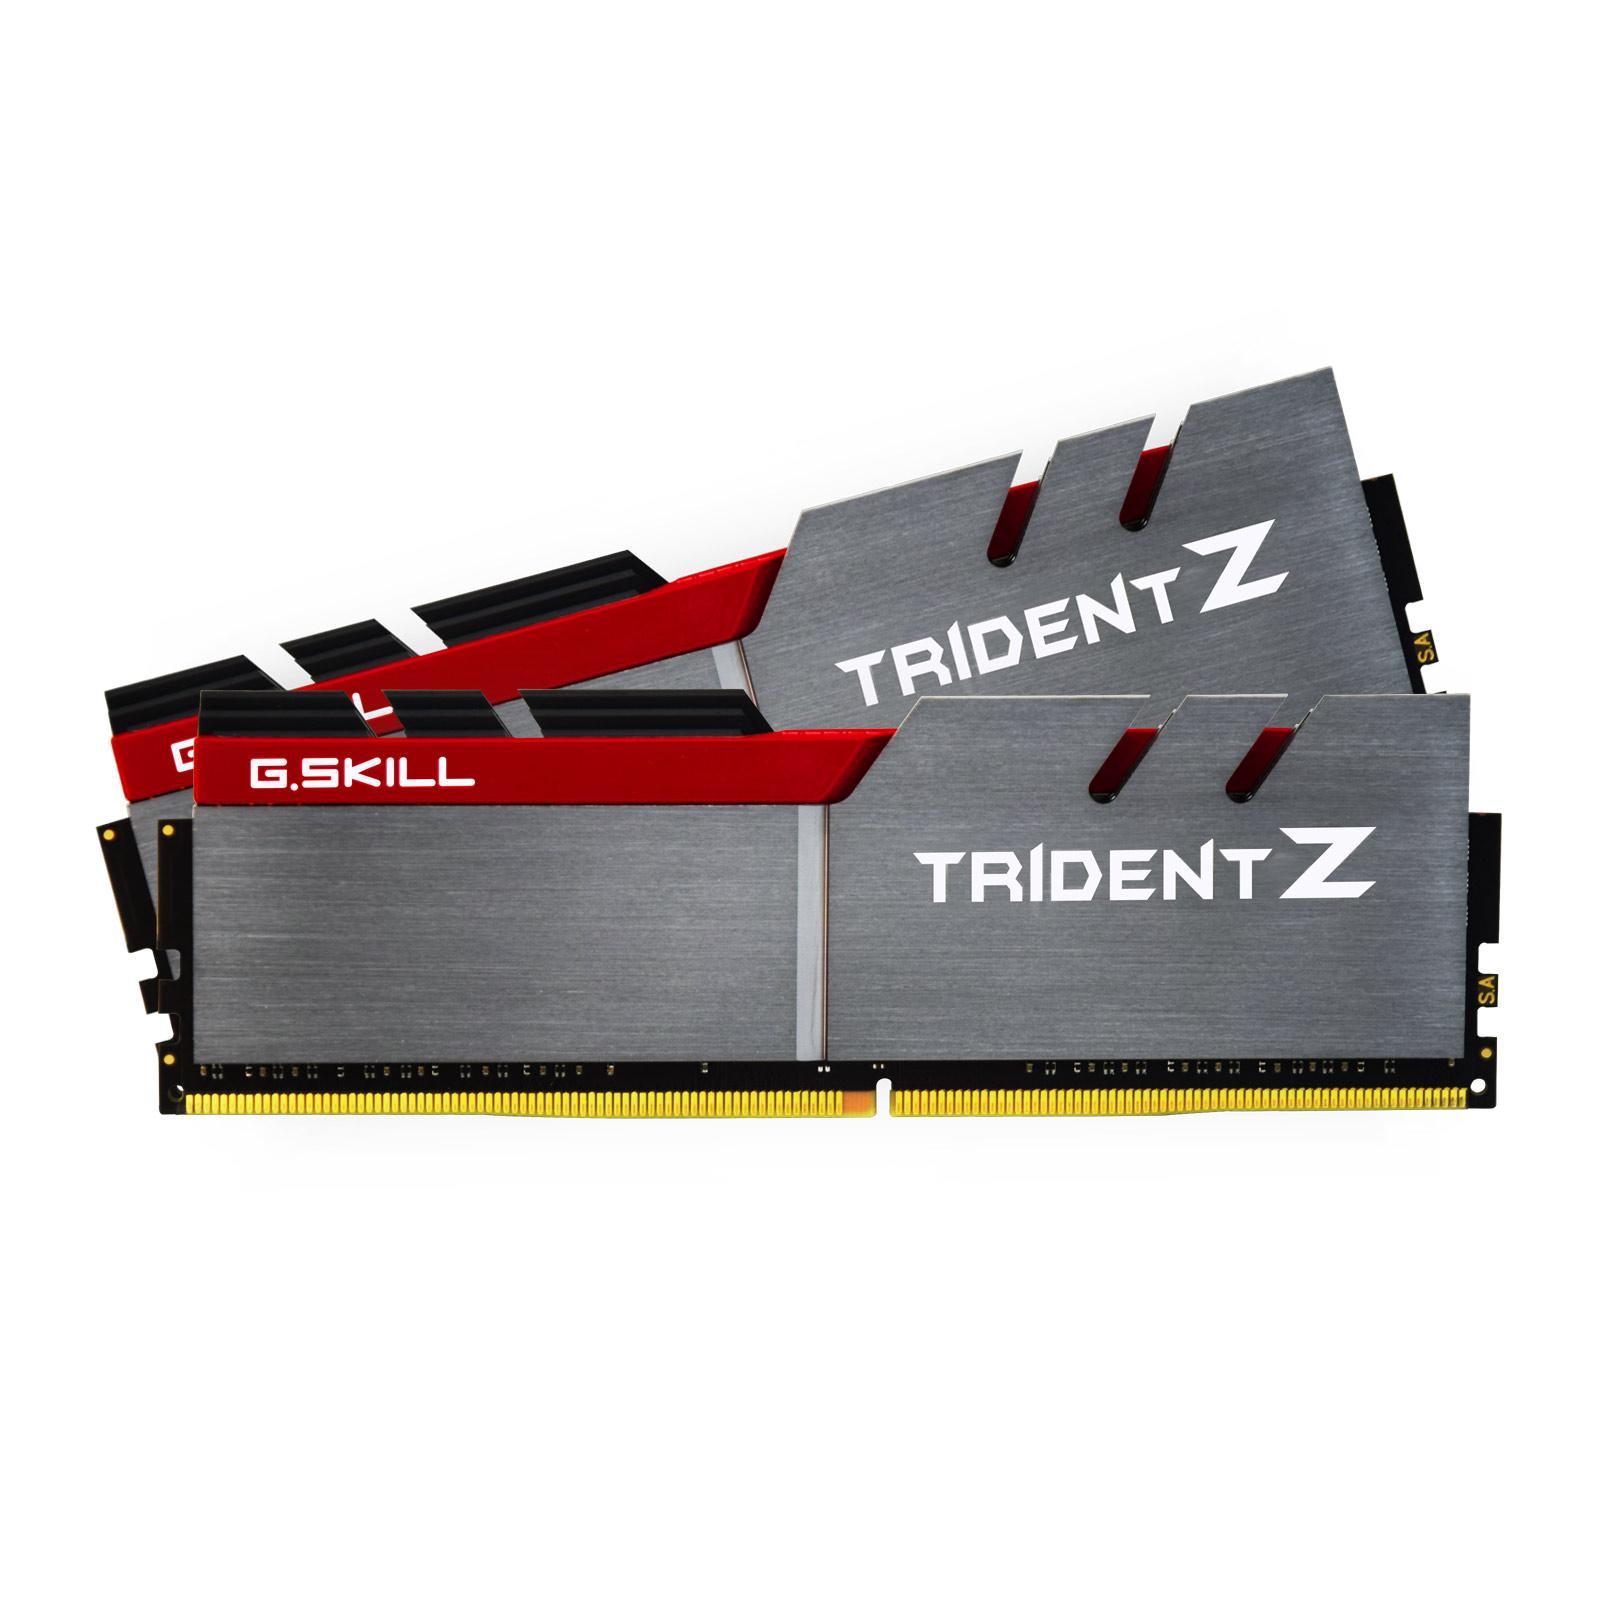 G.Skill Trident Z 16 Go (2x 8 Go) DDR4 3400 MHz CL16.jpg G.Skill Trident Z  16 Go (2x 8 Go) DDR4 3400 MHz CL16.jpg ... 679e03f354e0